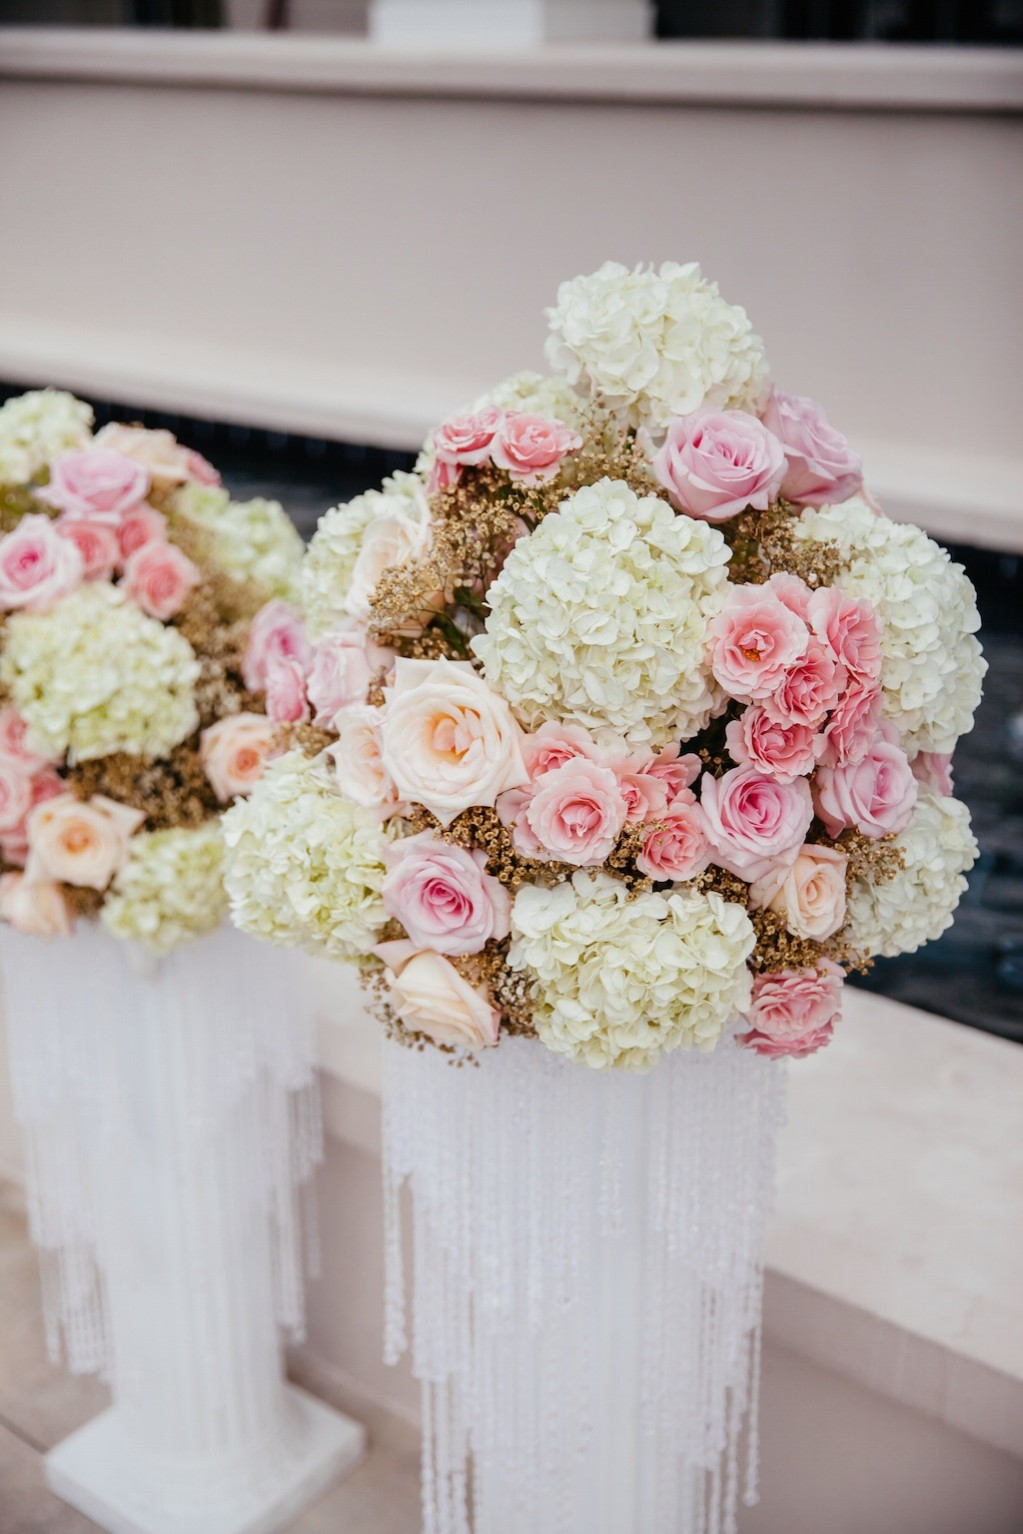 Rose Wedding Ceremony Flowers with Rhinestones by Northside Florist